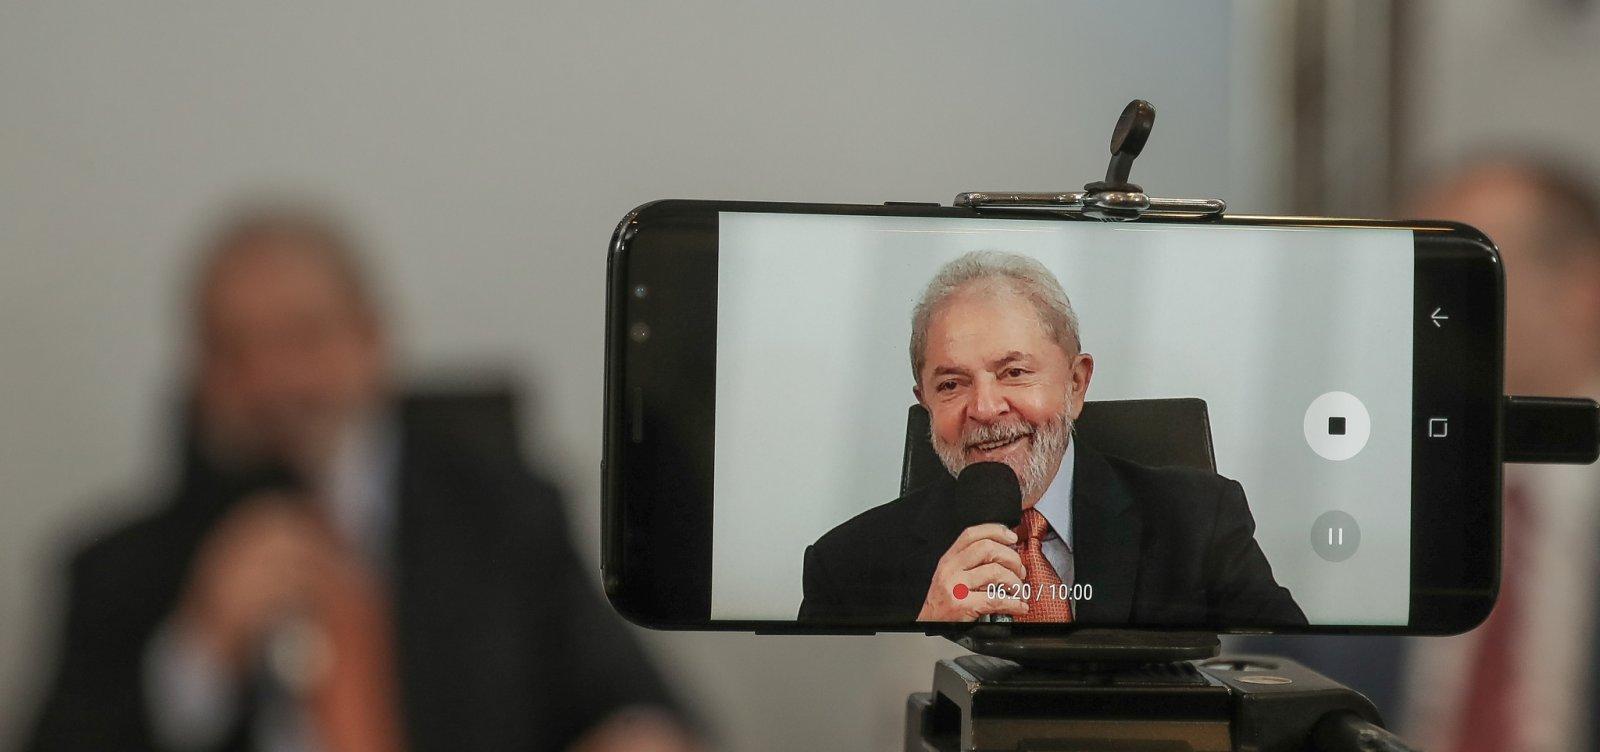 [Ministro do Supremoautoriza Lula a conceder entrevista]